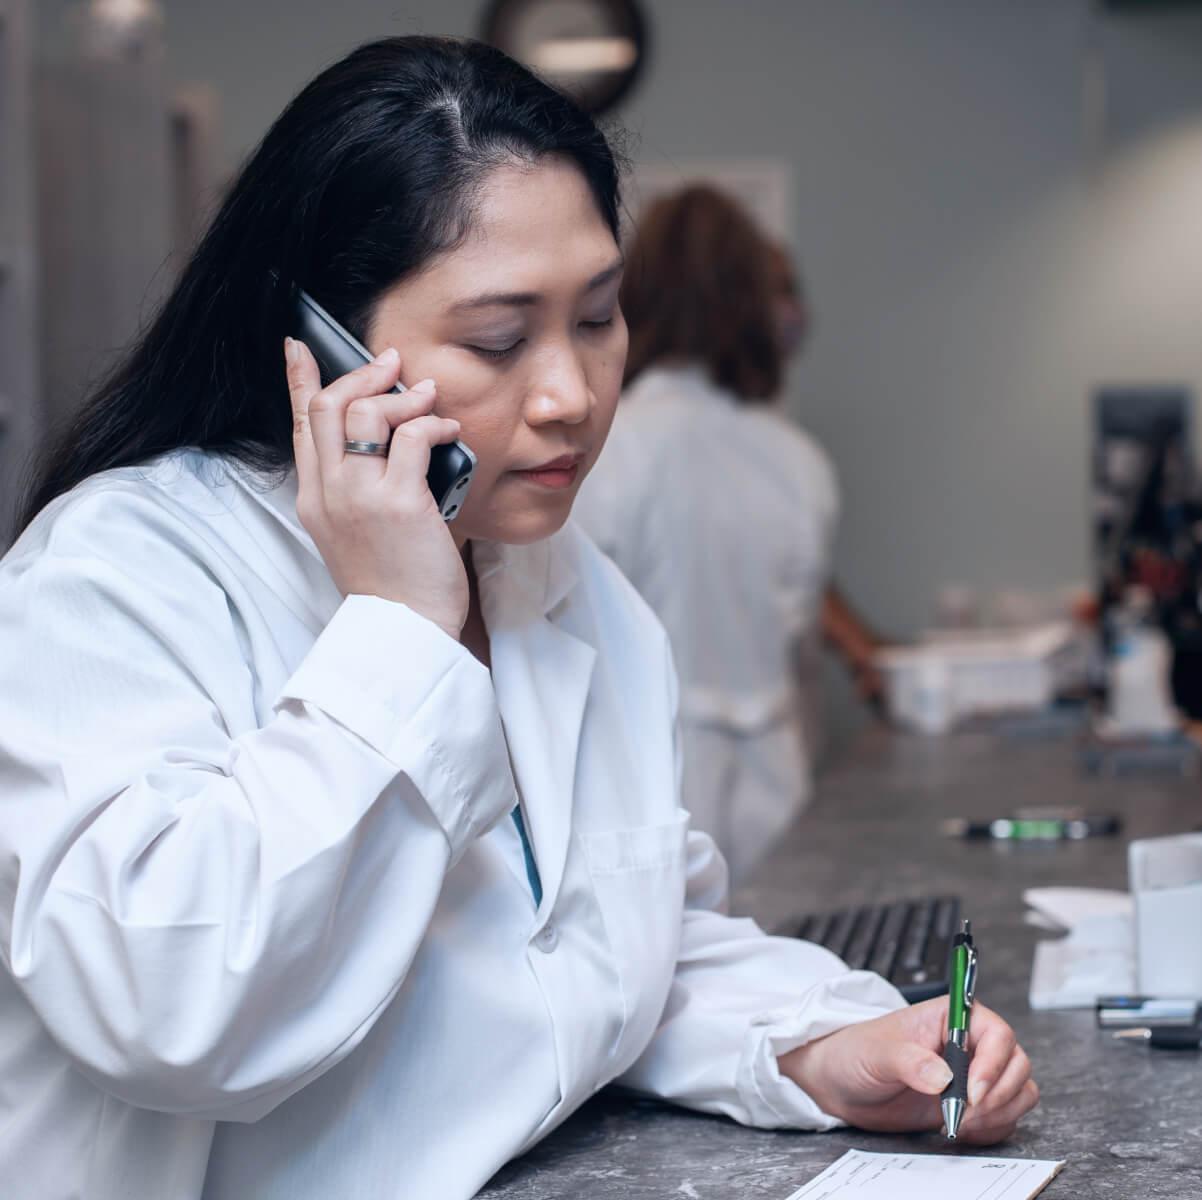 pharmacist on phone with prescription pad